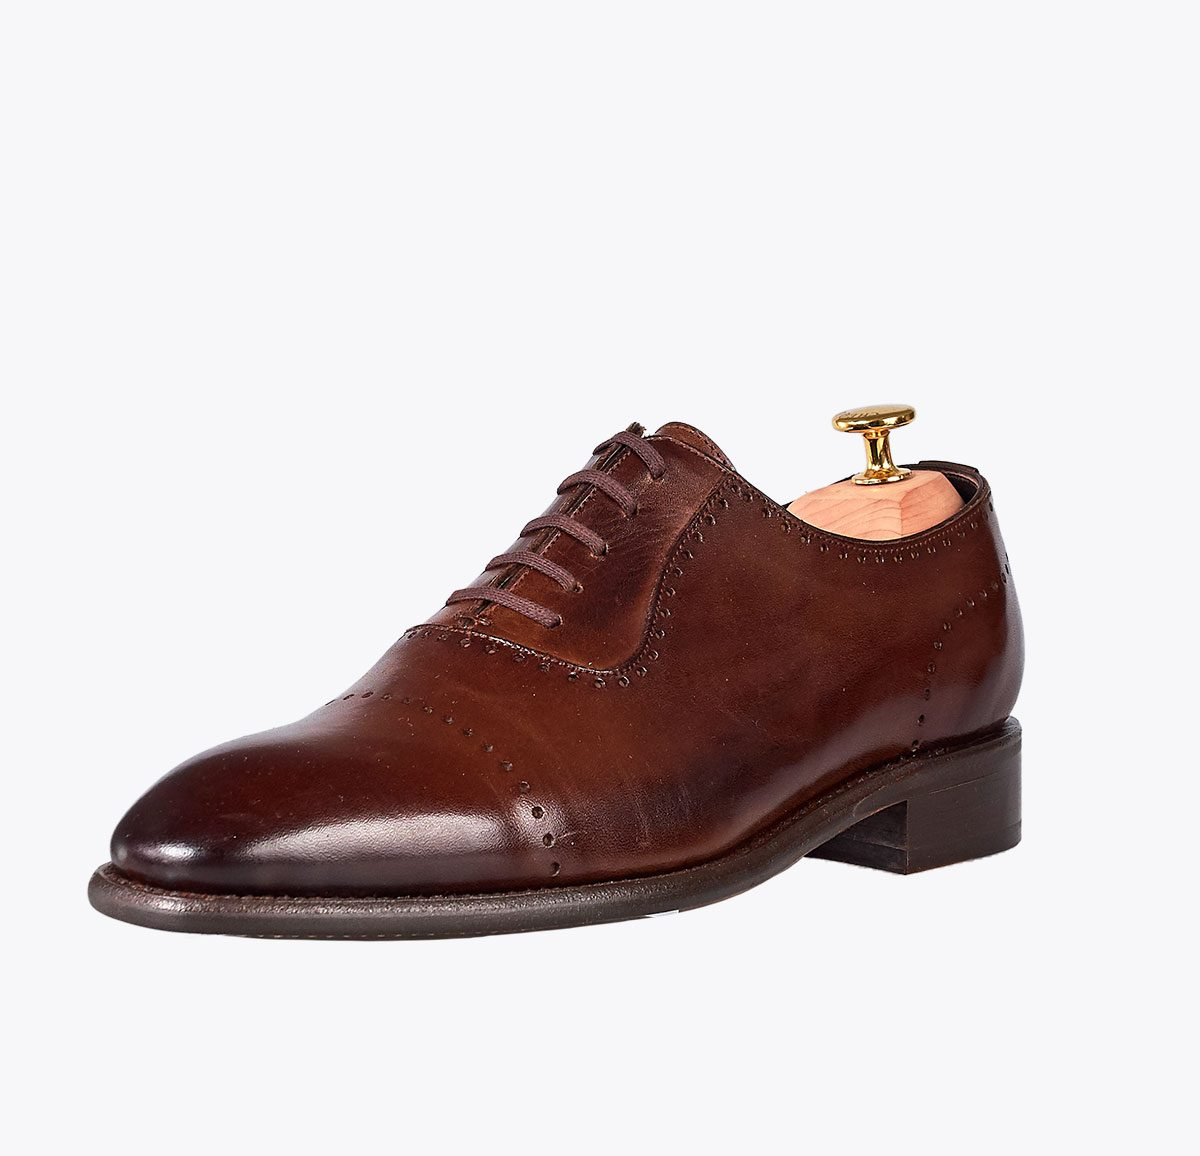 Zapato titanic testa hecho a mano en mandalashoes, Santanyí Mallorca. Hand made shoes. Nach Mass Schuhe